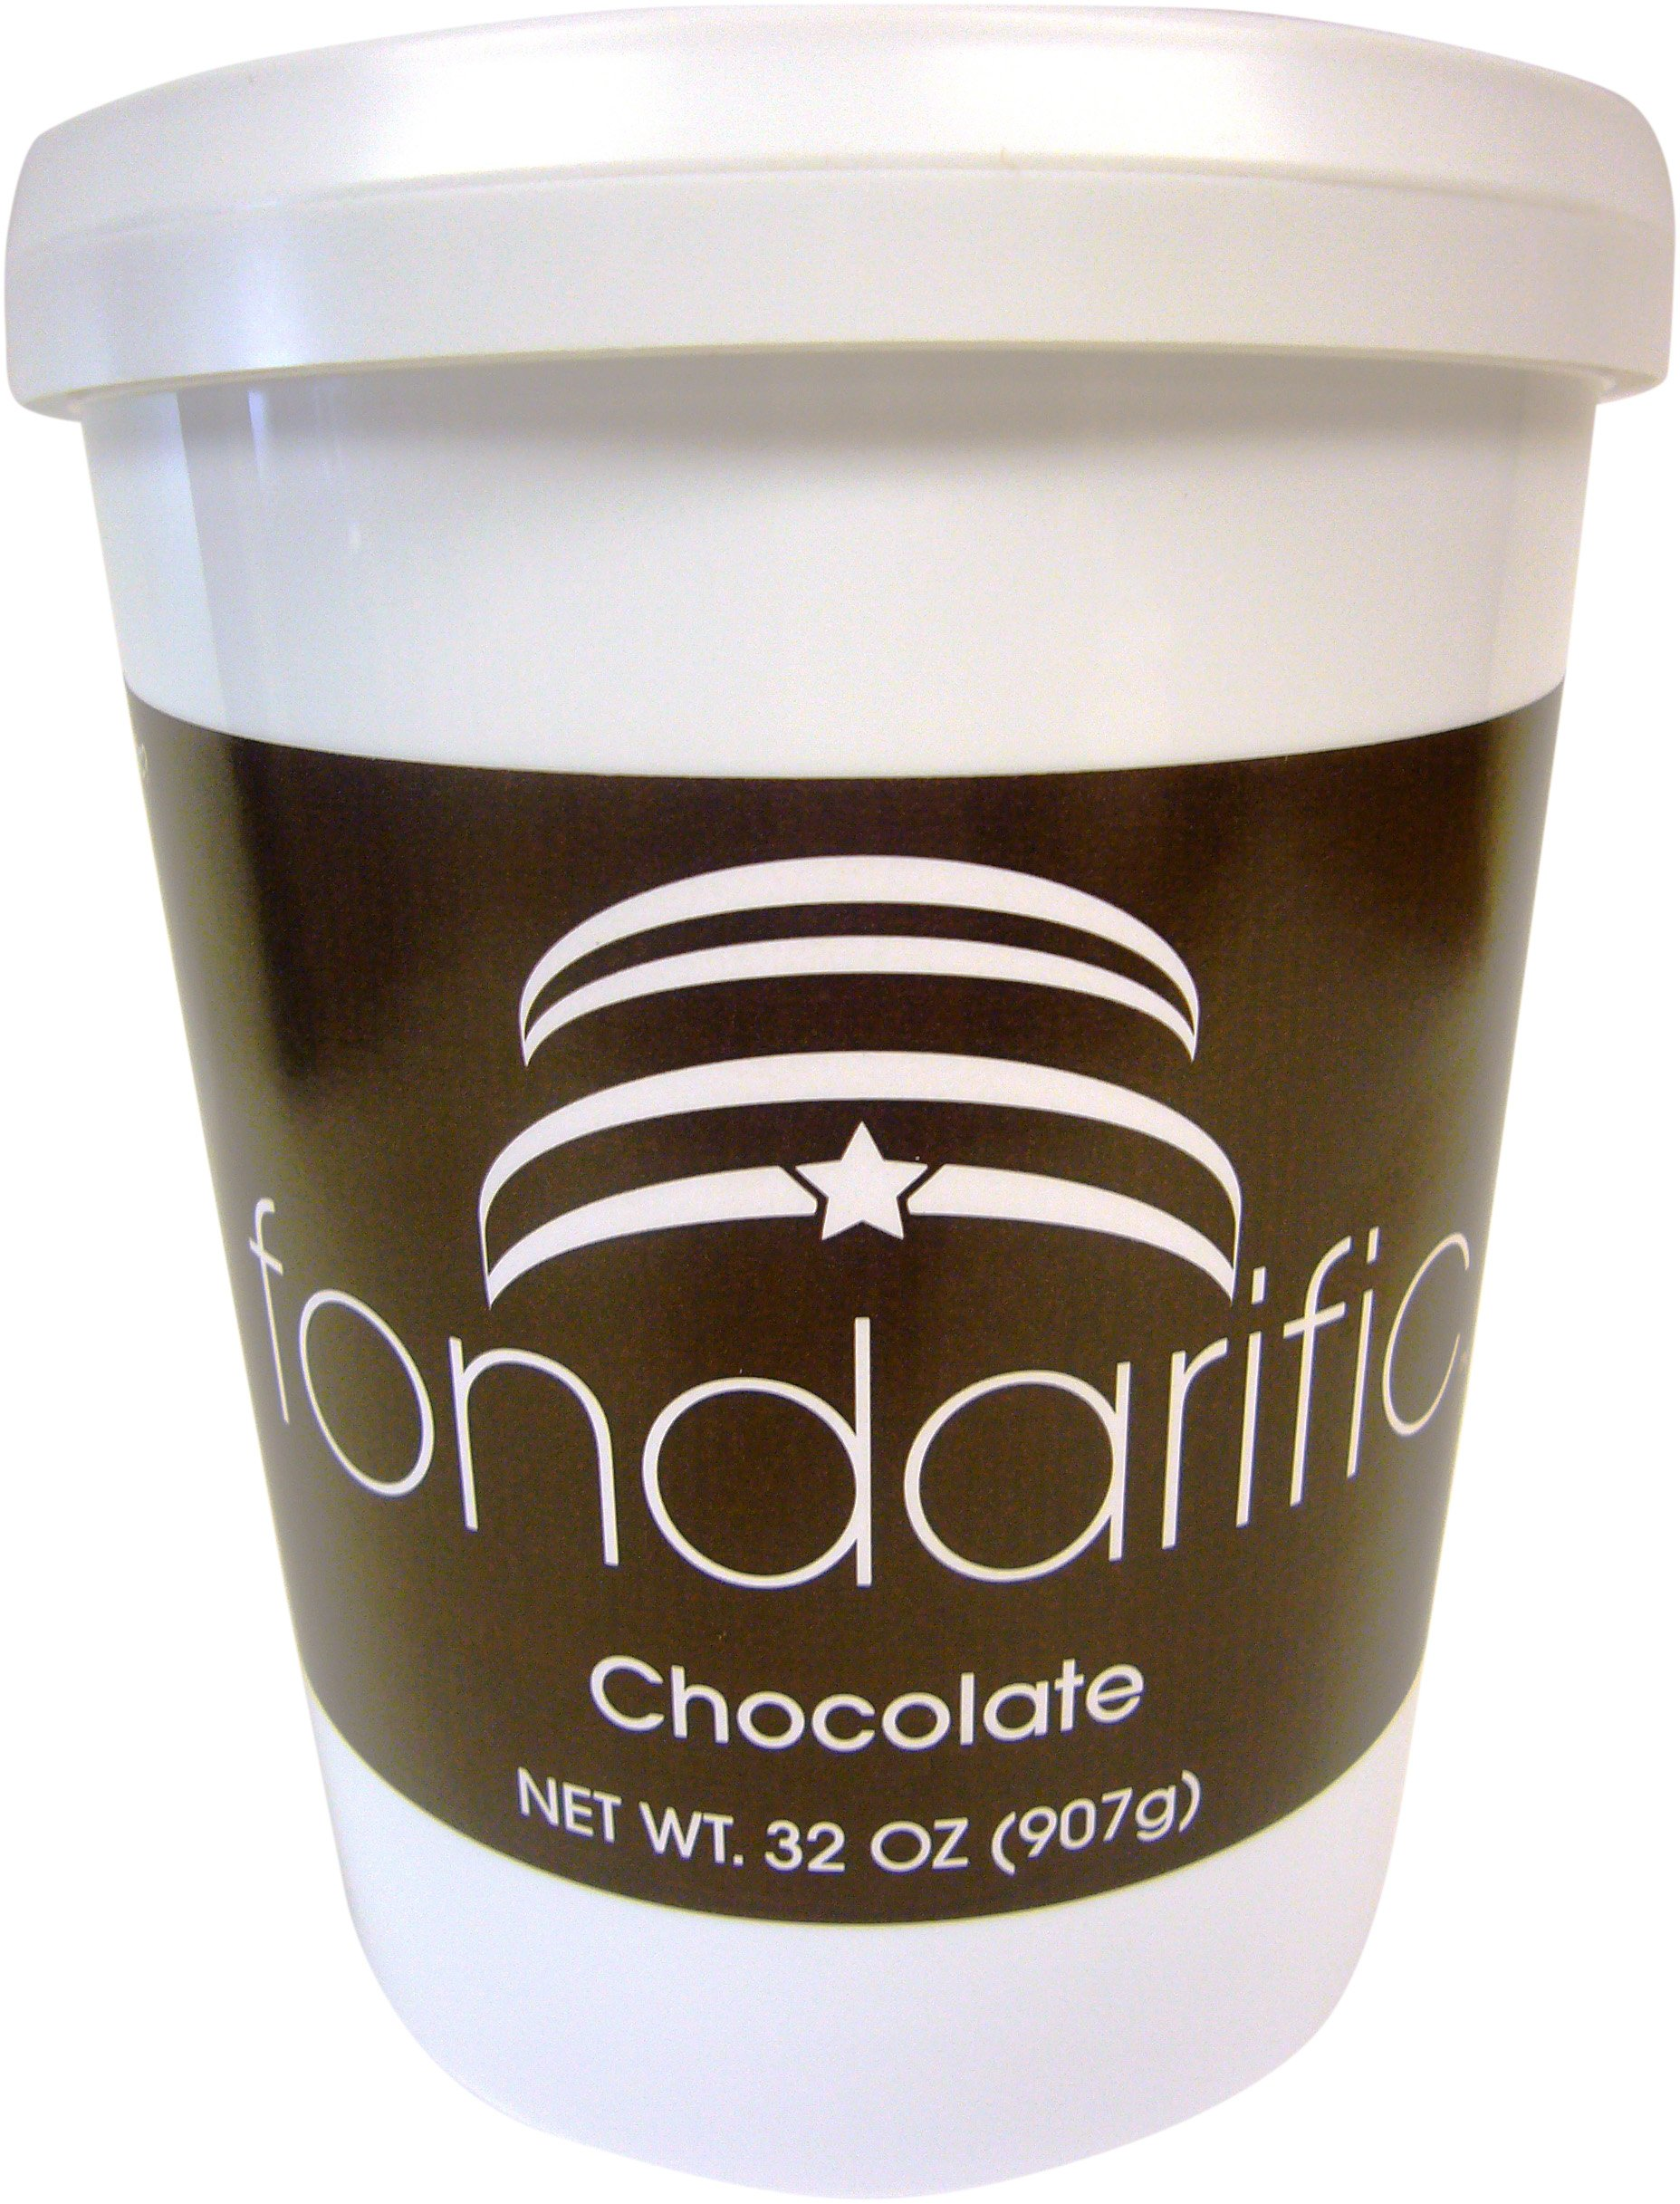 Fondarific Chocolate Fondant Brown, 2-Pounds by Fondarific (Image #2)